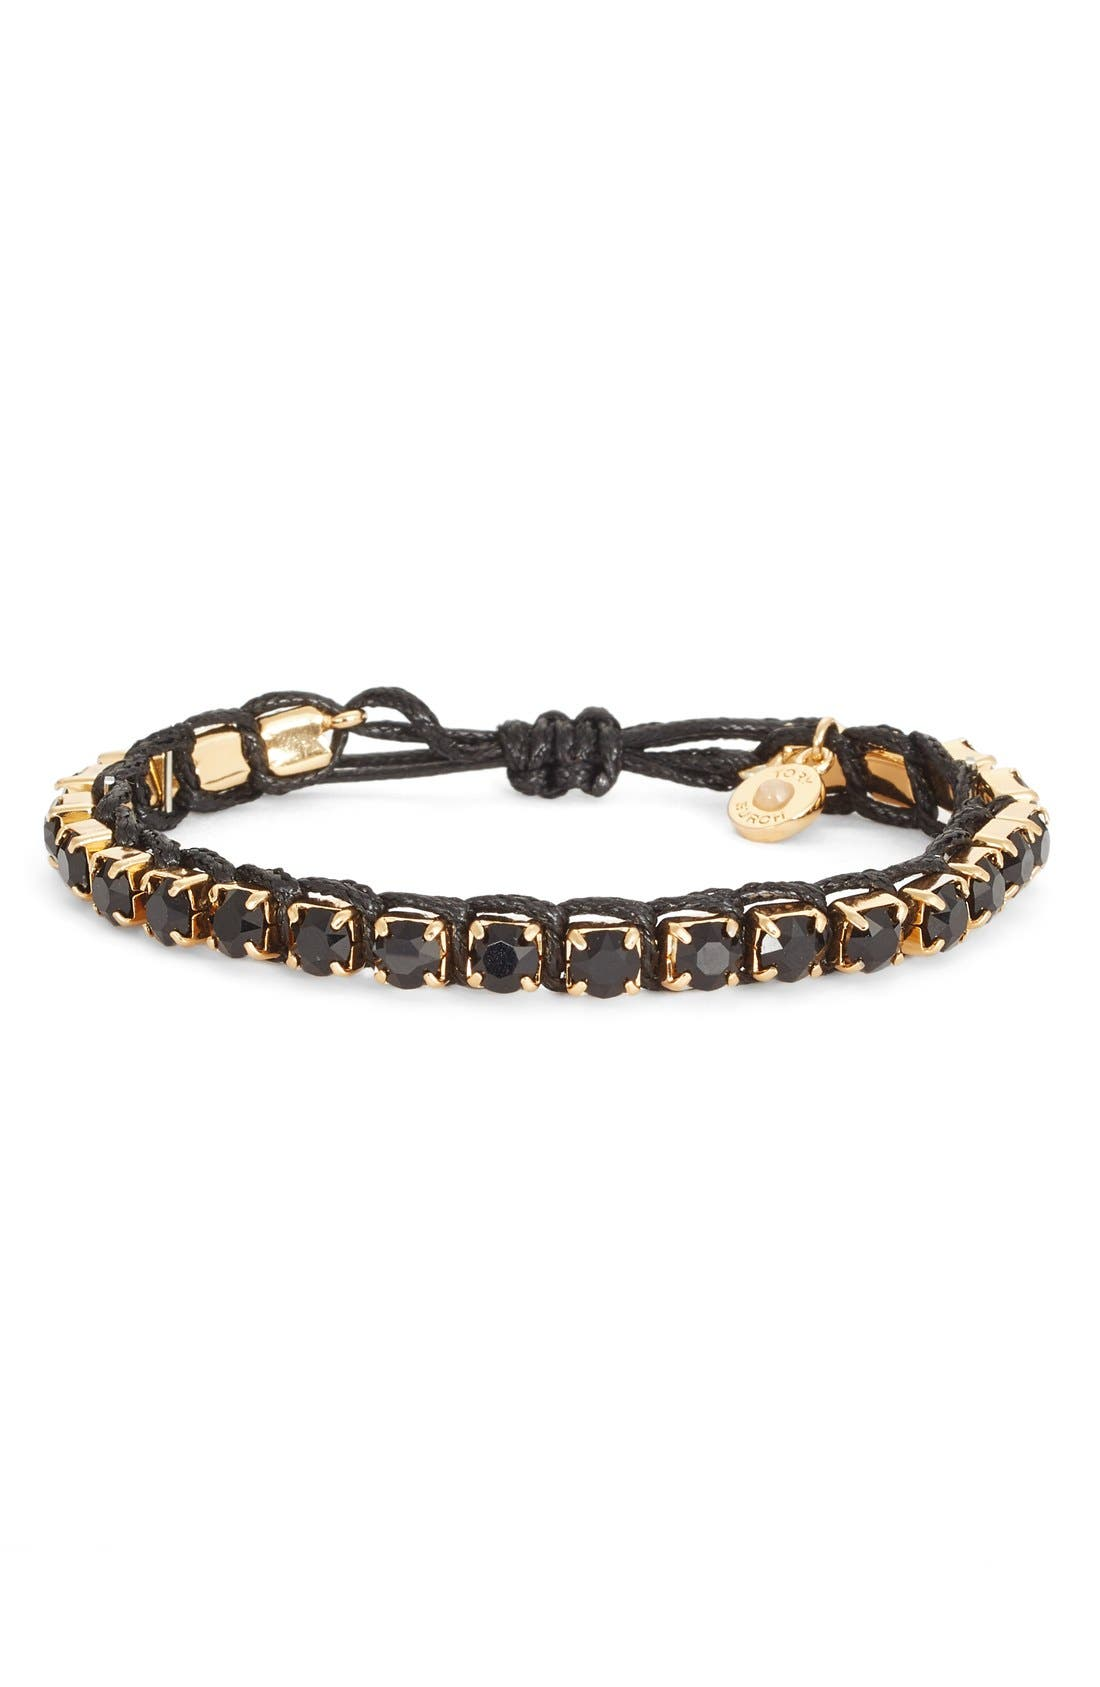 Tory Burch Friendship Bracelet